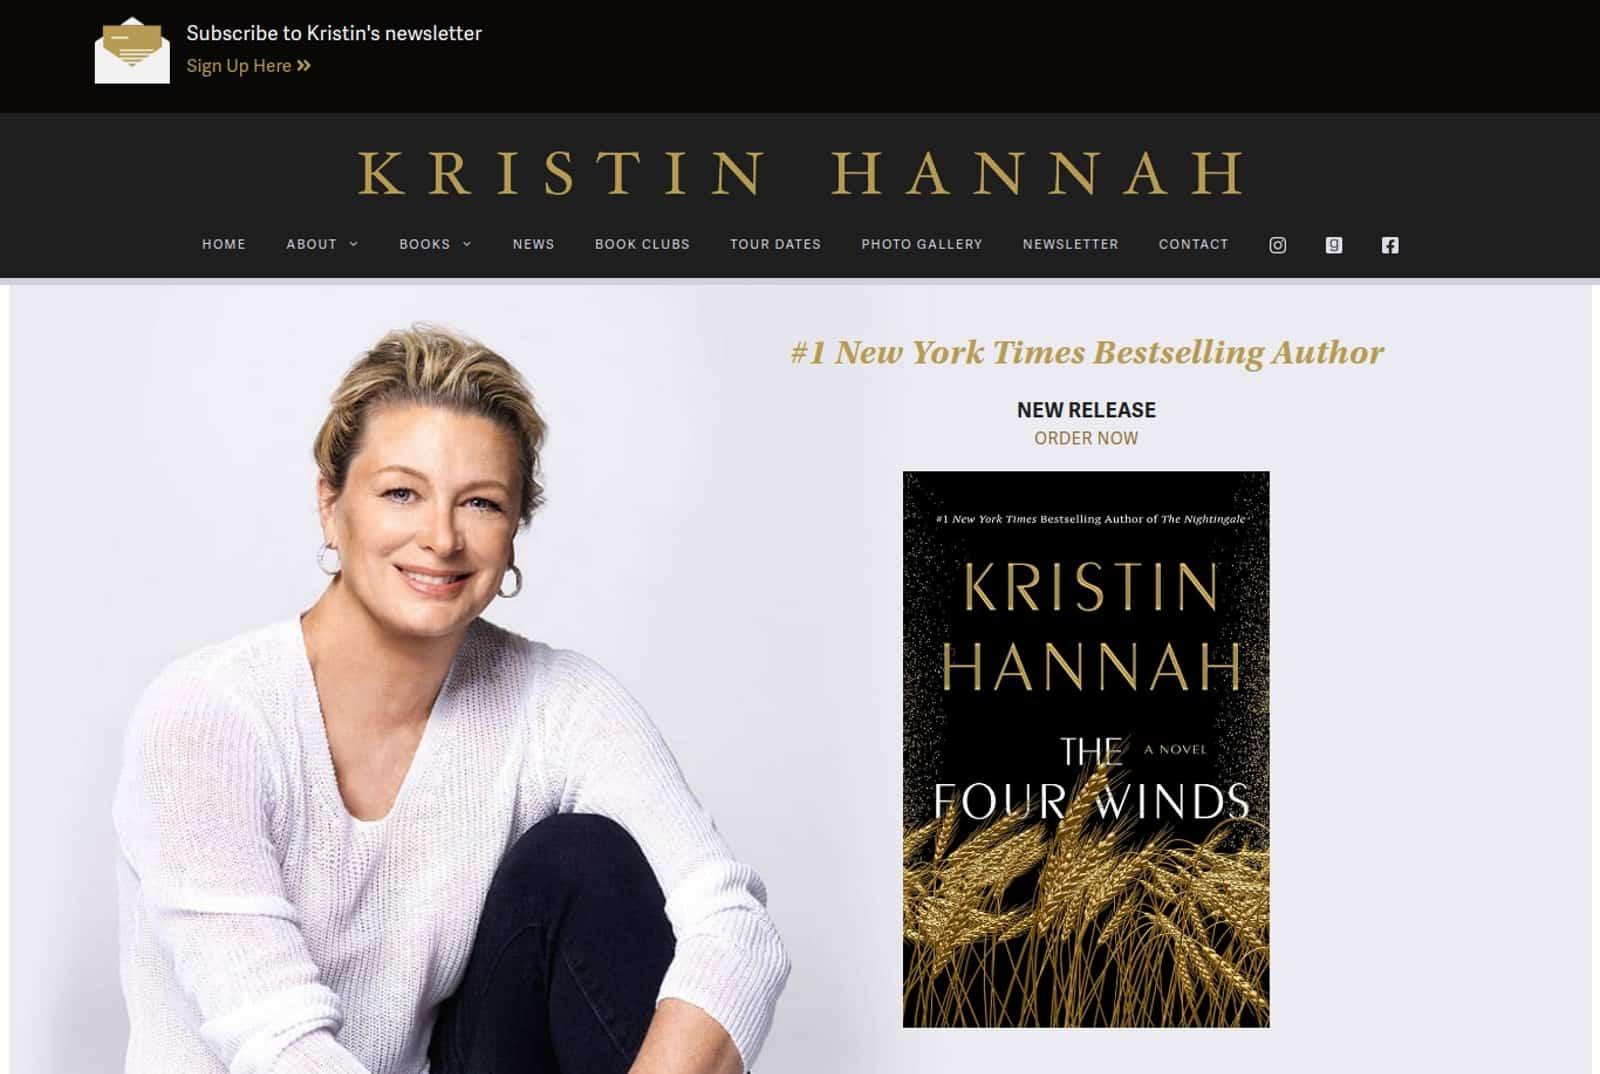 Kristin Hannah Slide Image Feb 2021